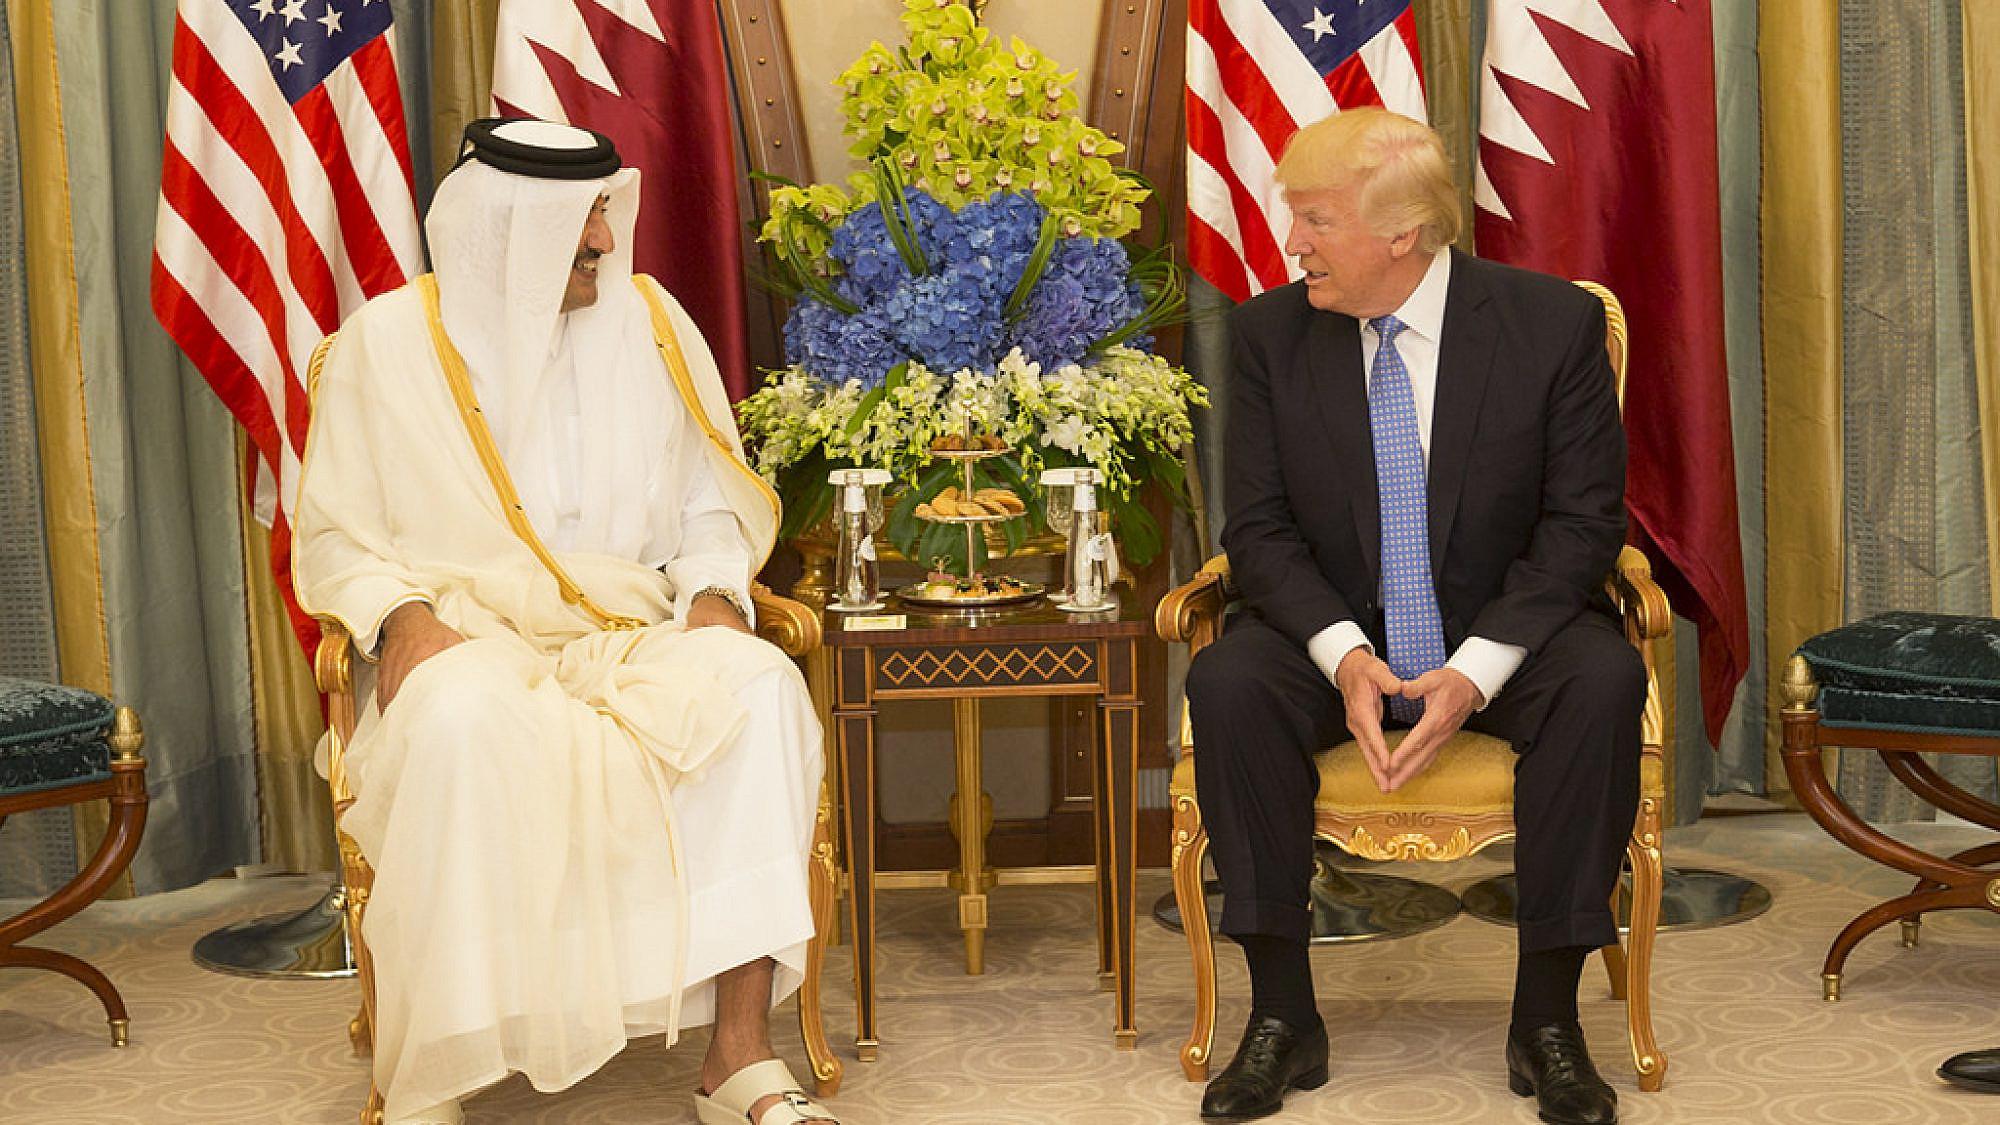 U.S. President Donald Trump meets with the Emir of Qatar during their bilateral meeting on May 21, 2017, at the Ritz-Carlton Hotel in Riyadh, Saudi Arabia. Official White House Photo/Shealah Craighead.